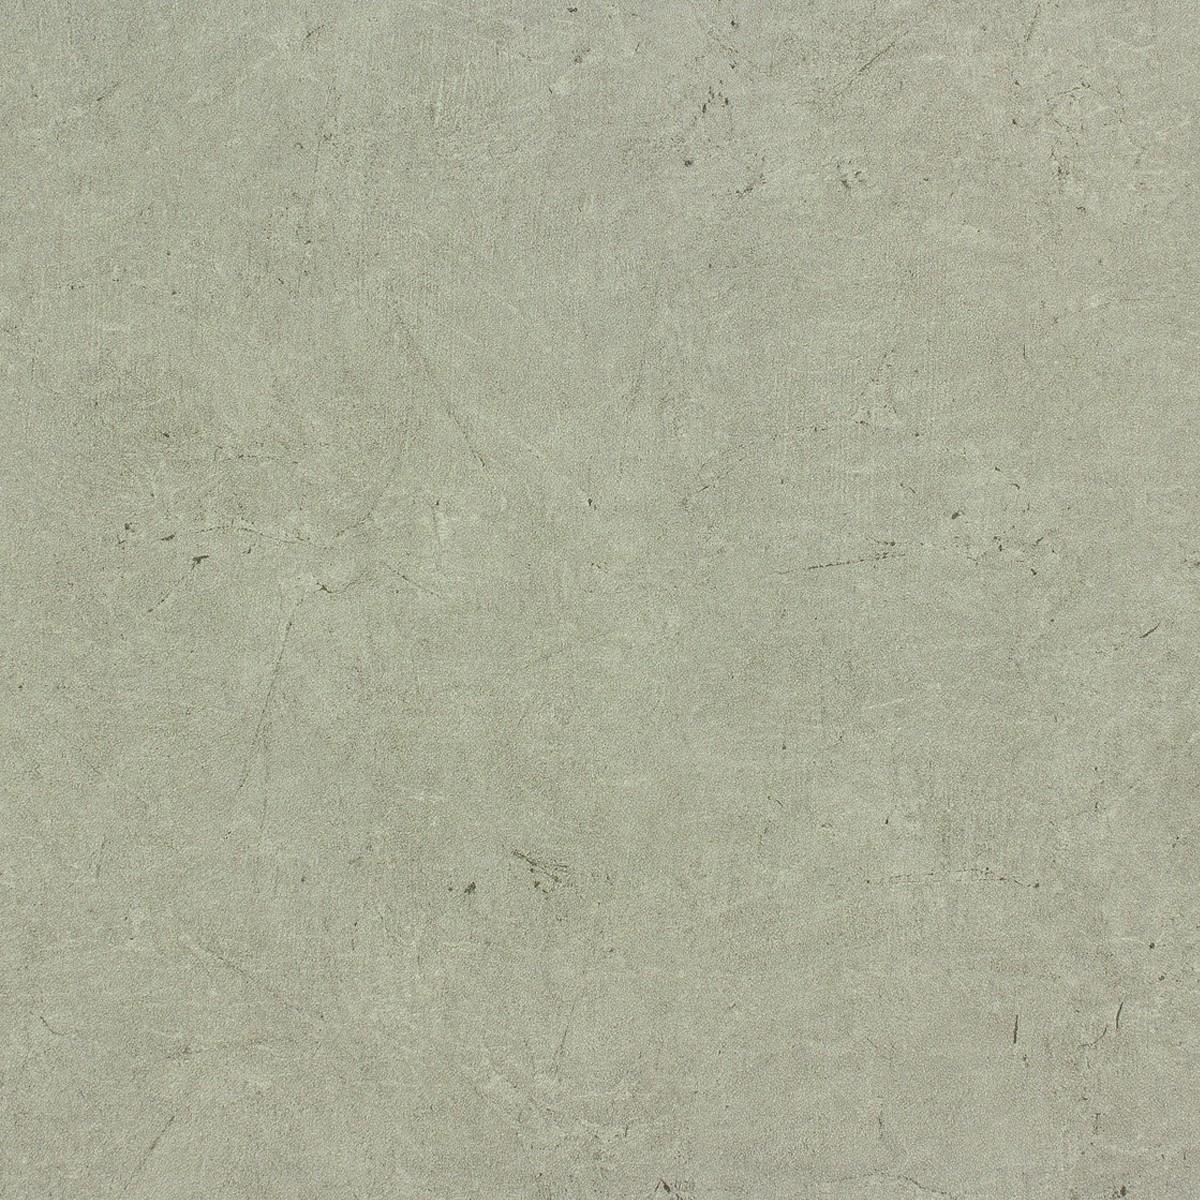 daniel hechter tapete design putz grau 95259 2. Black Bedroom Furniture Sets. Home Design Ideas